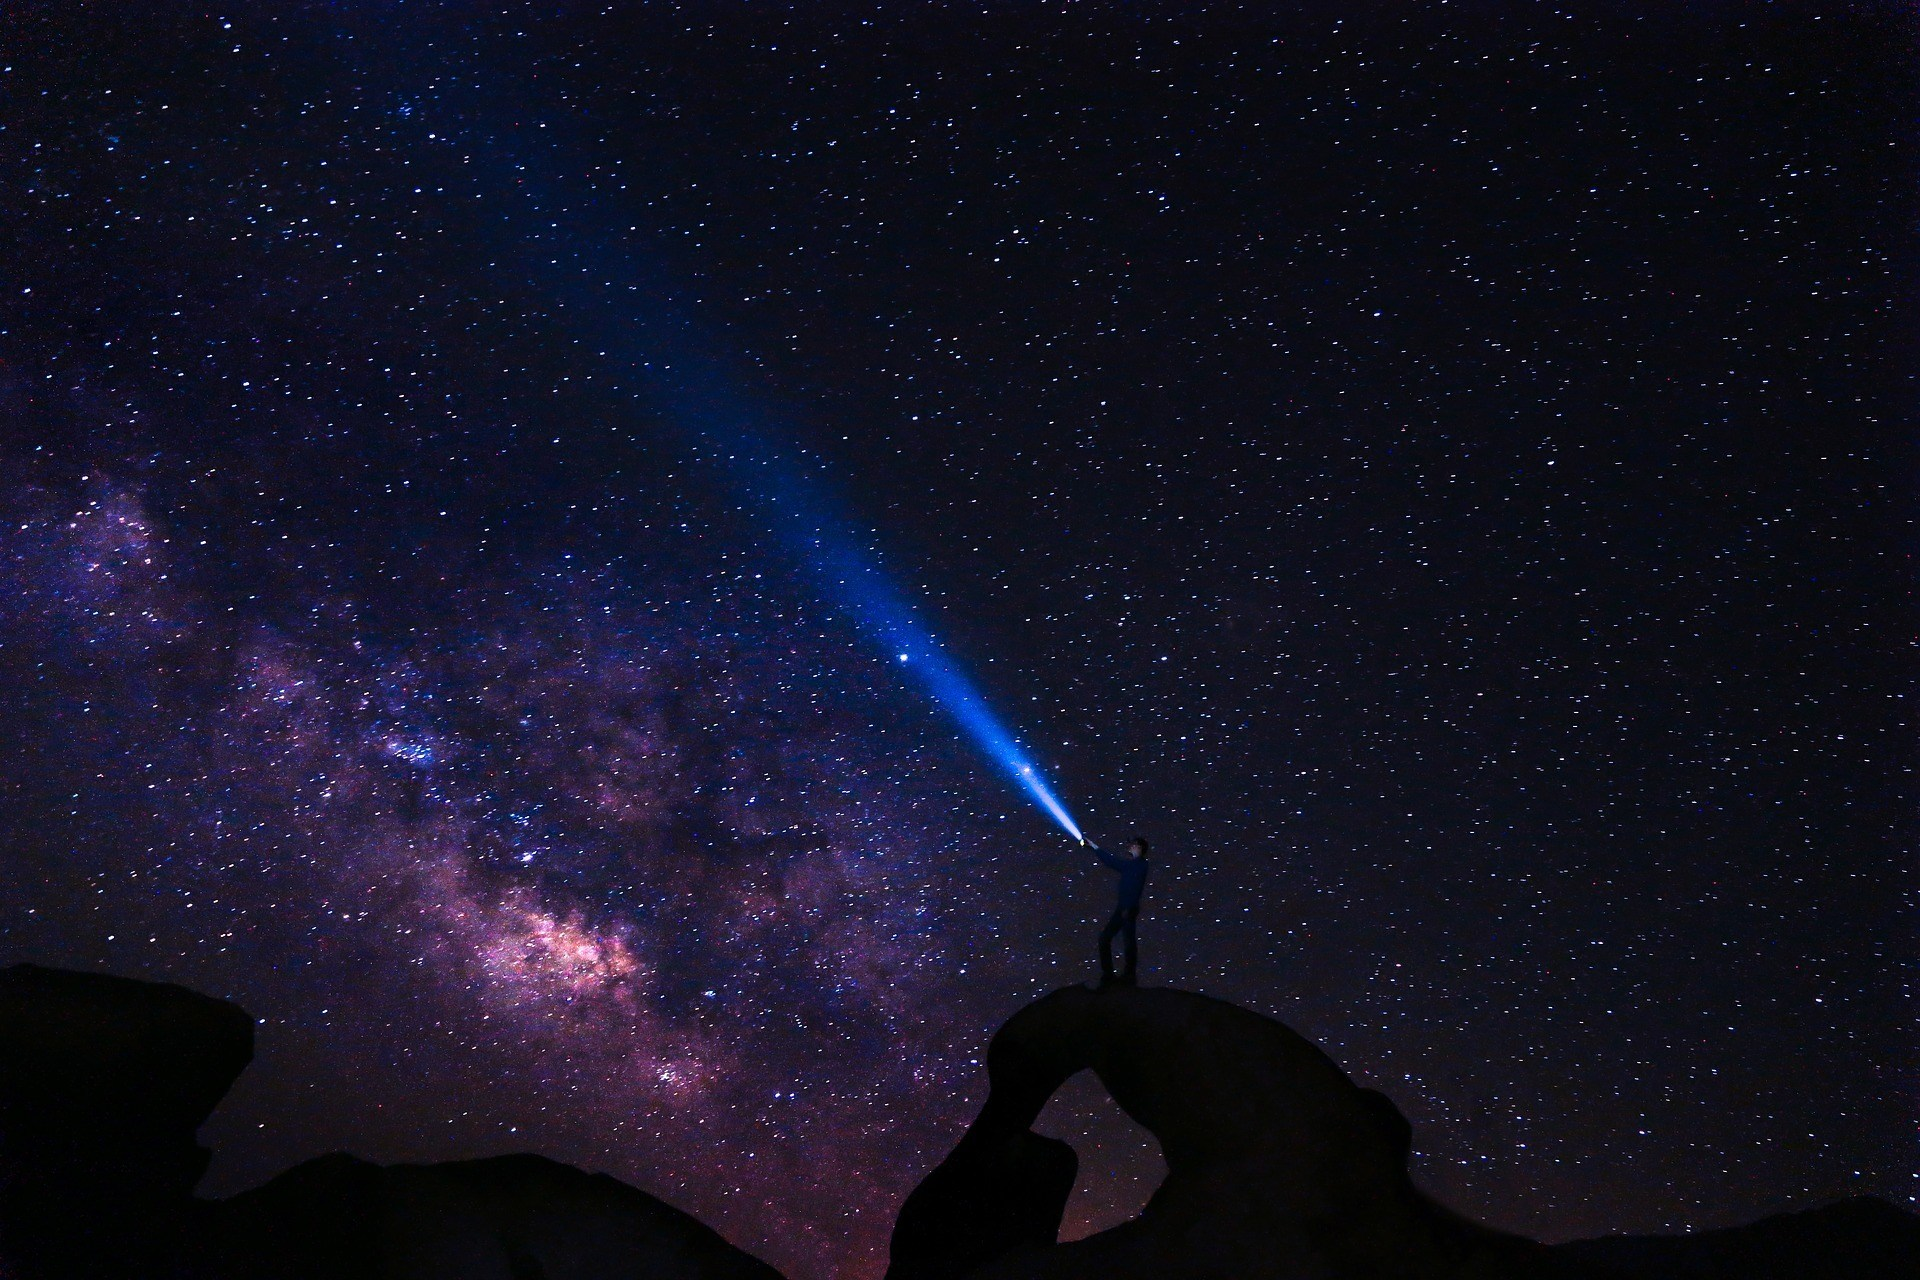 speak to the universe